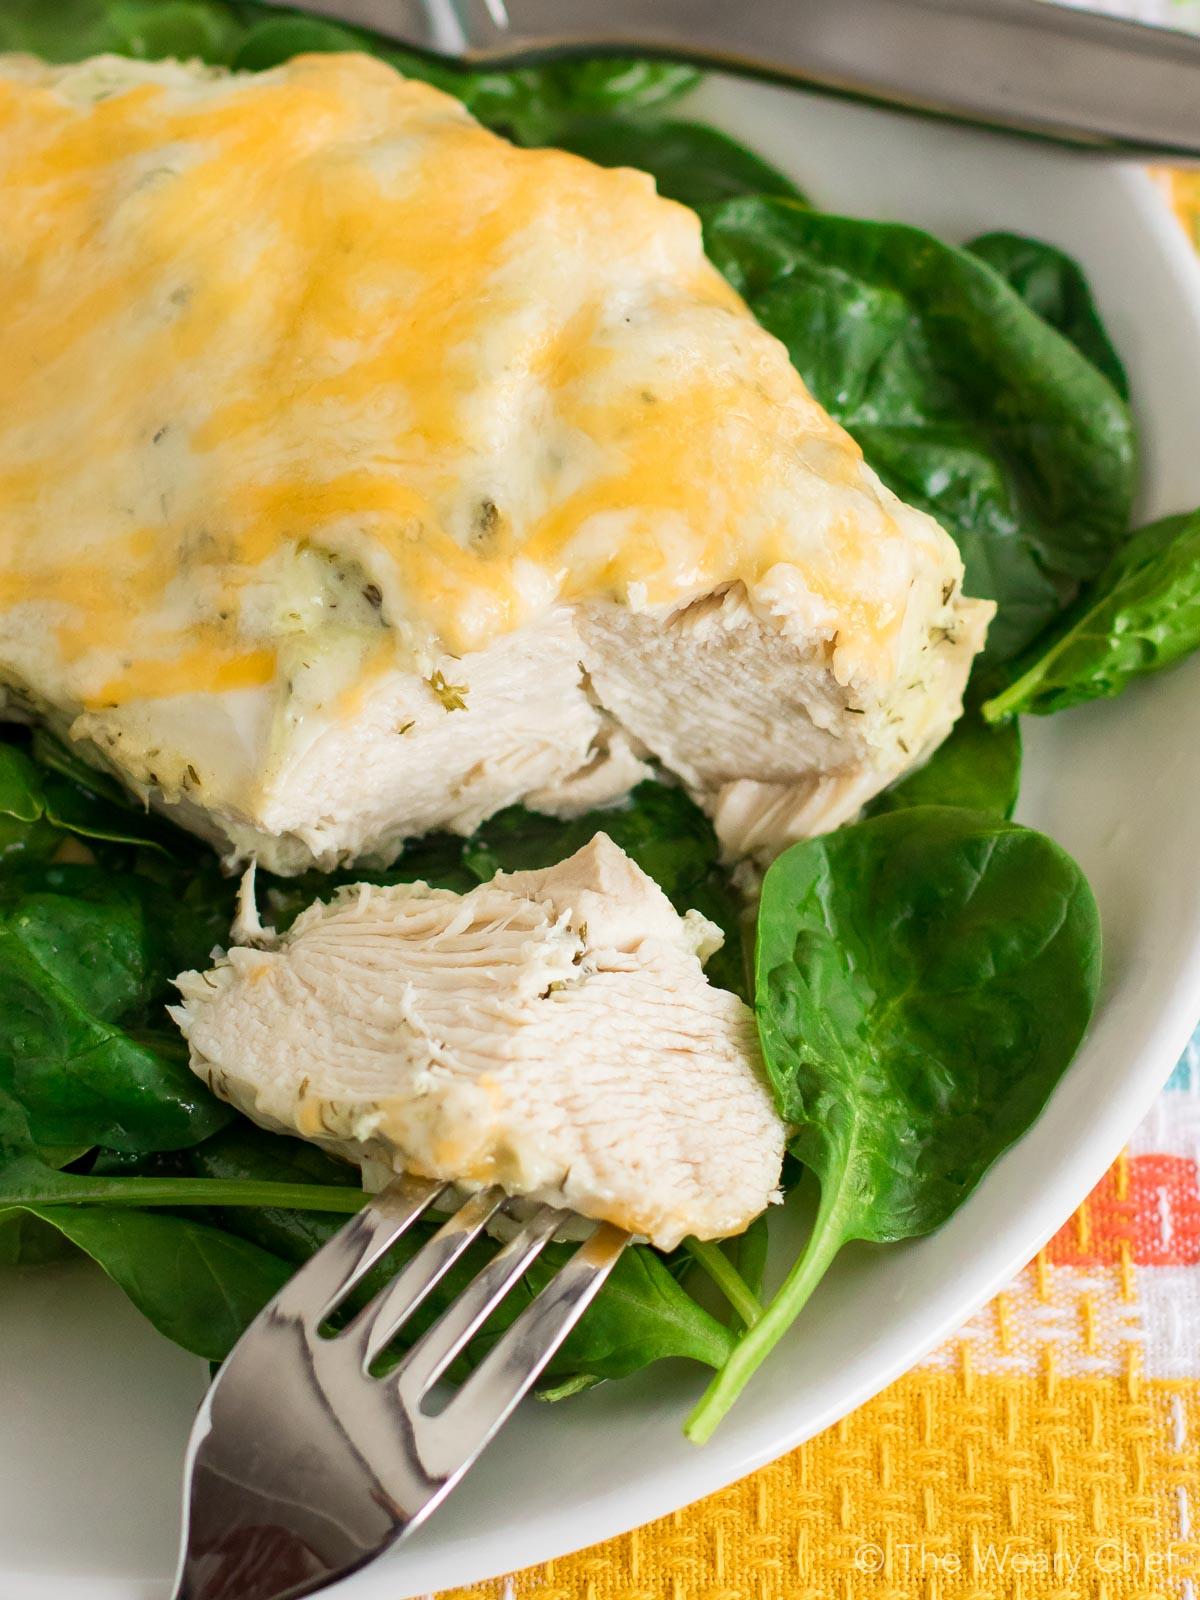 You'll love this juicy Greek Yogurt Chicken for dinner!